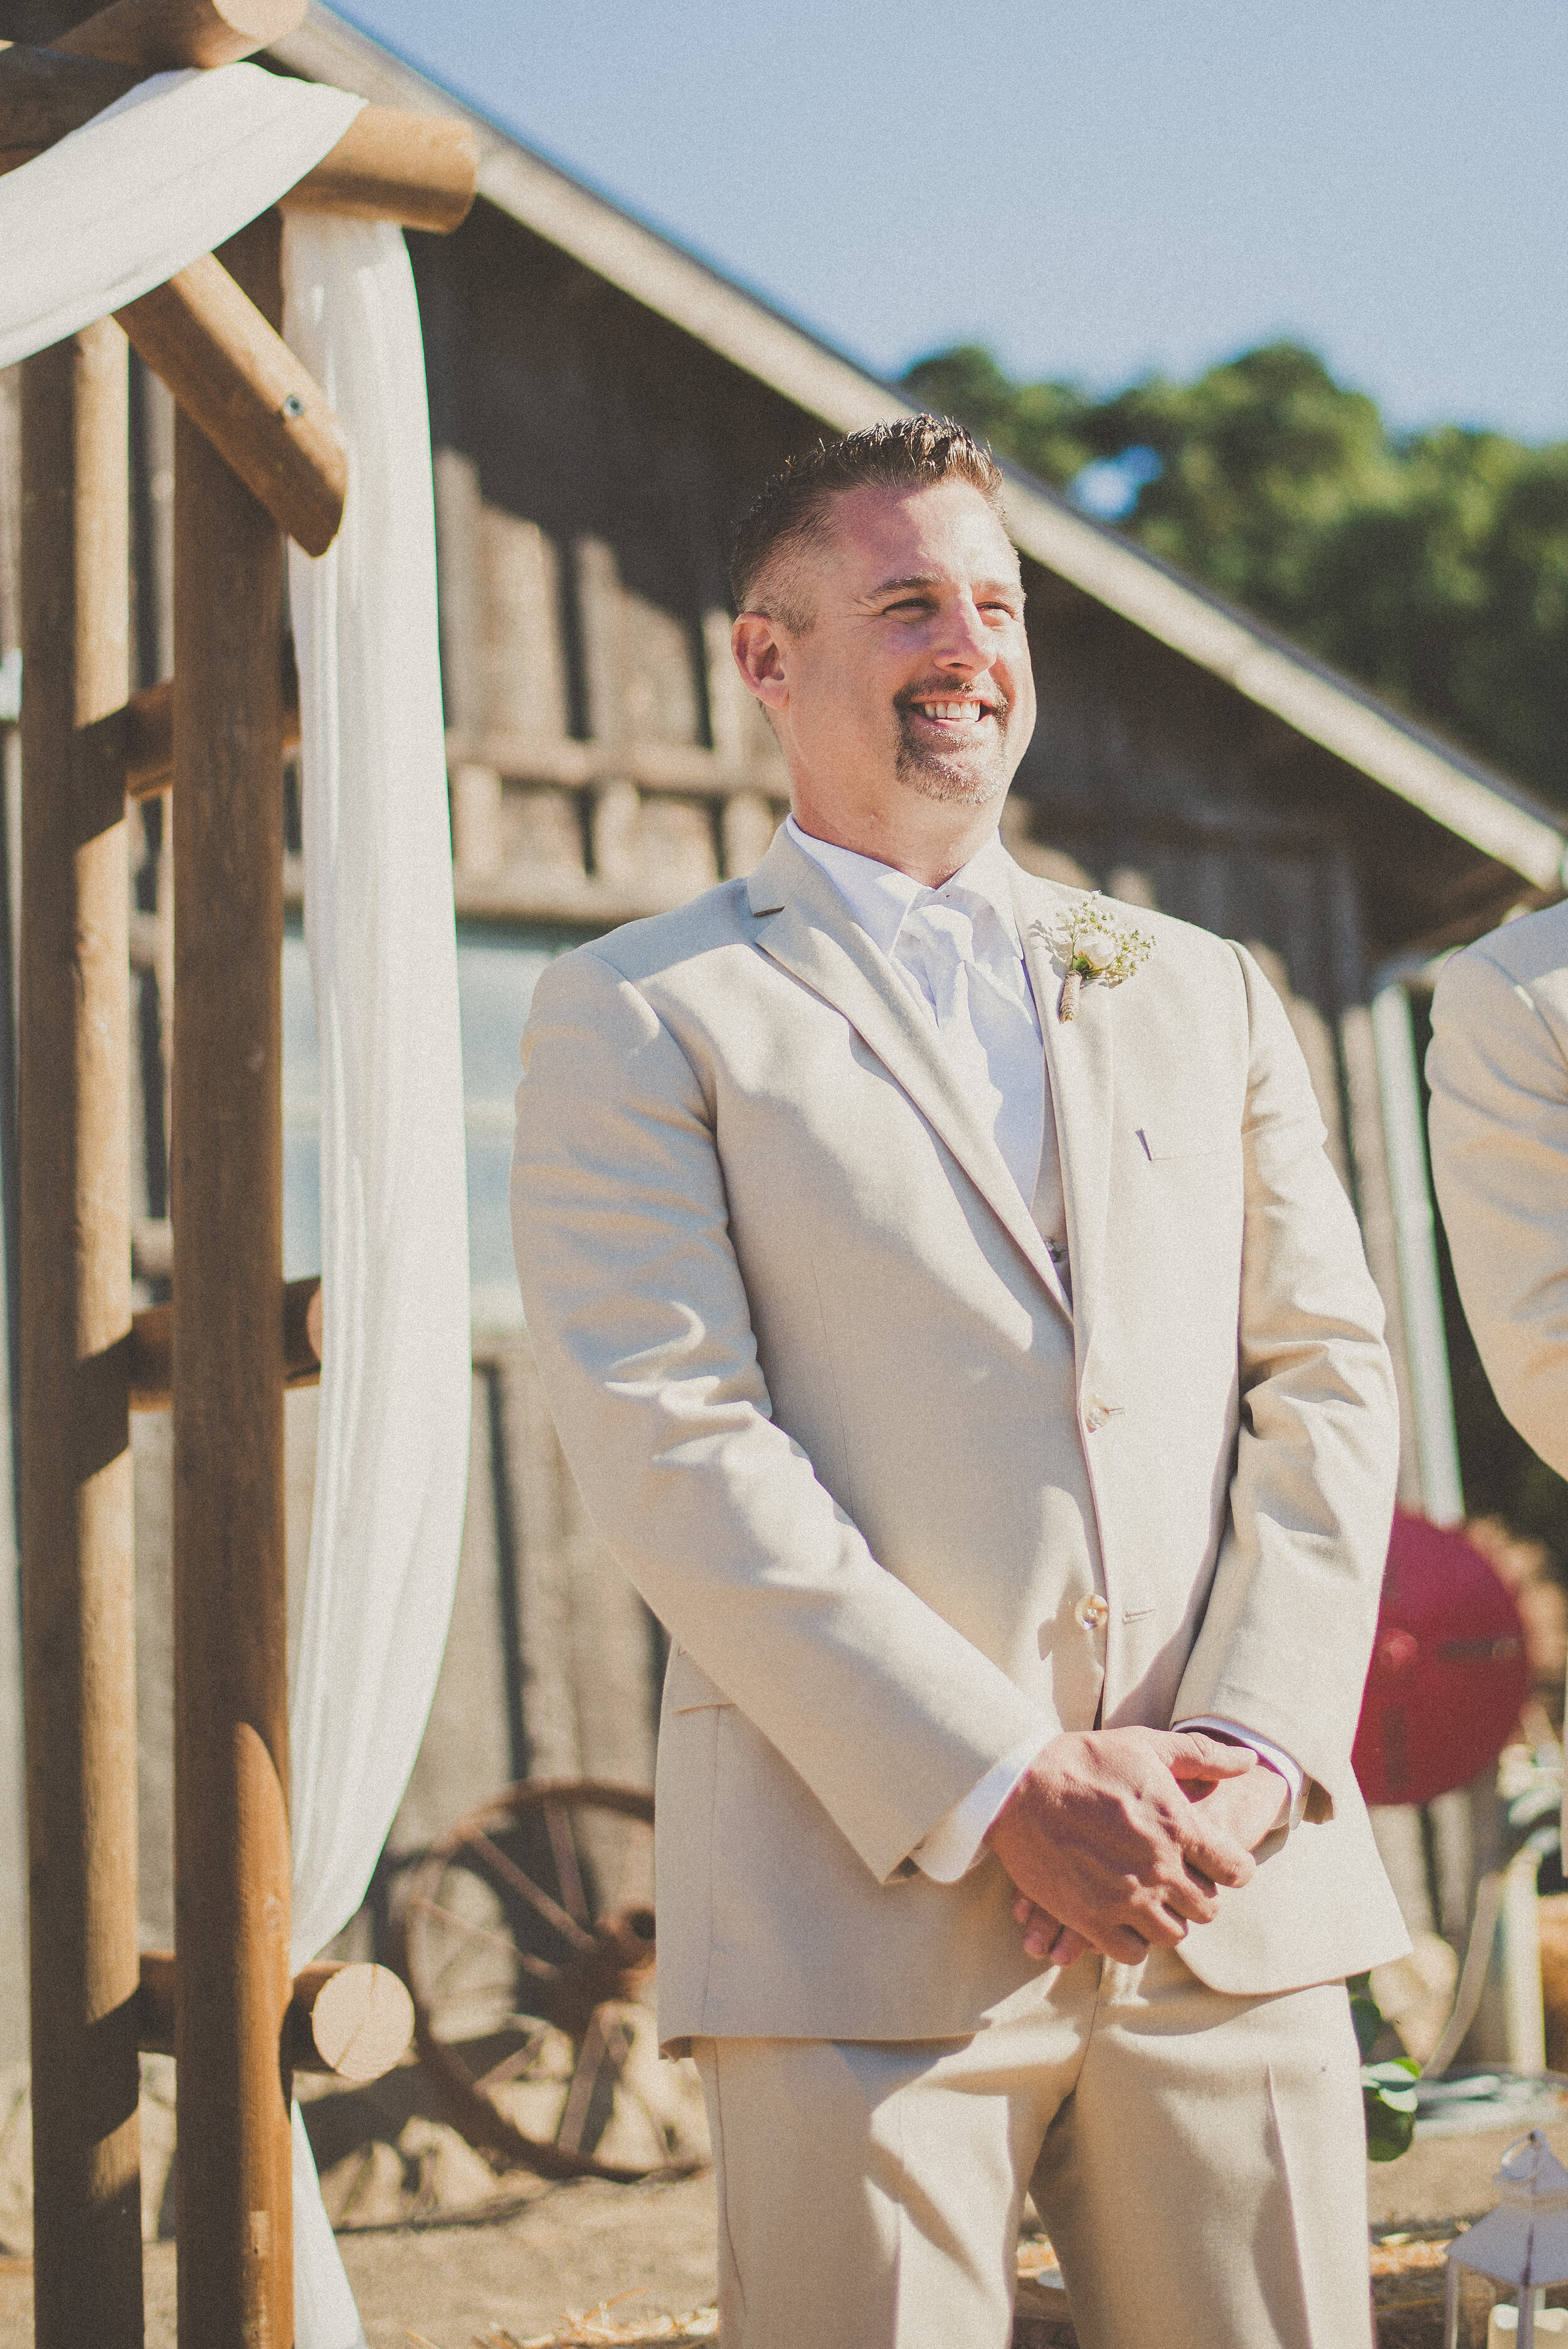 Roberts Wedding - Ceremony-56.jpg